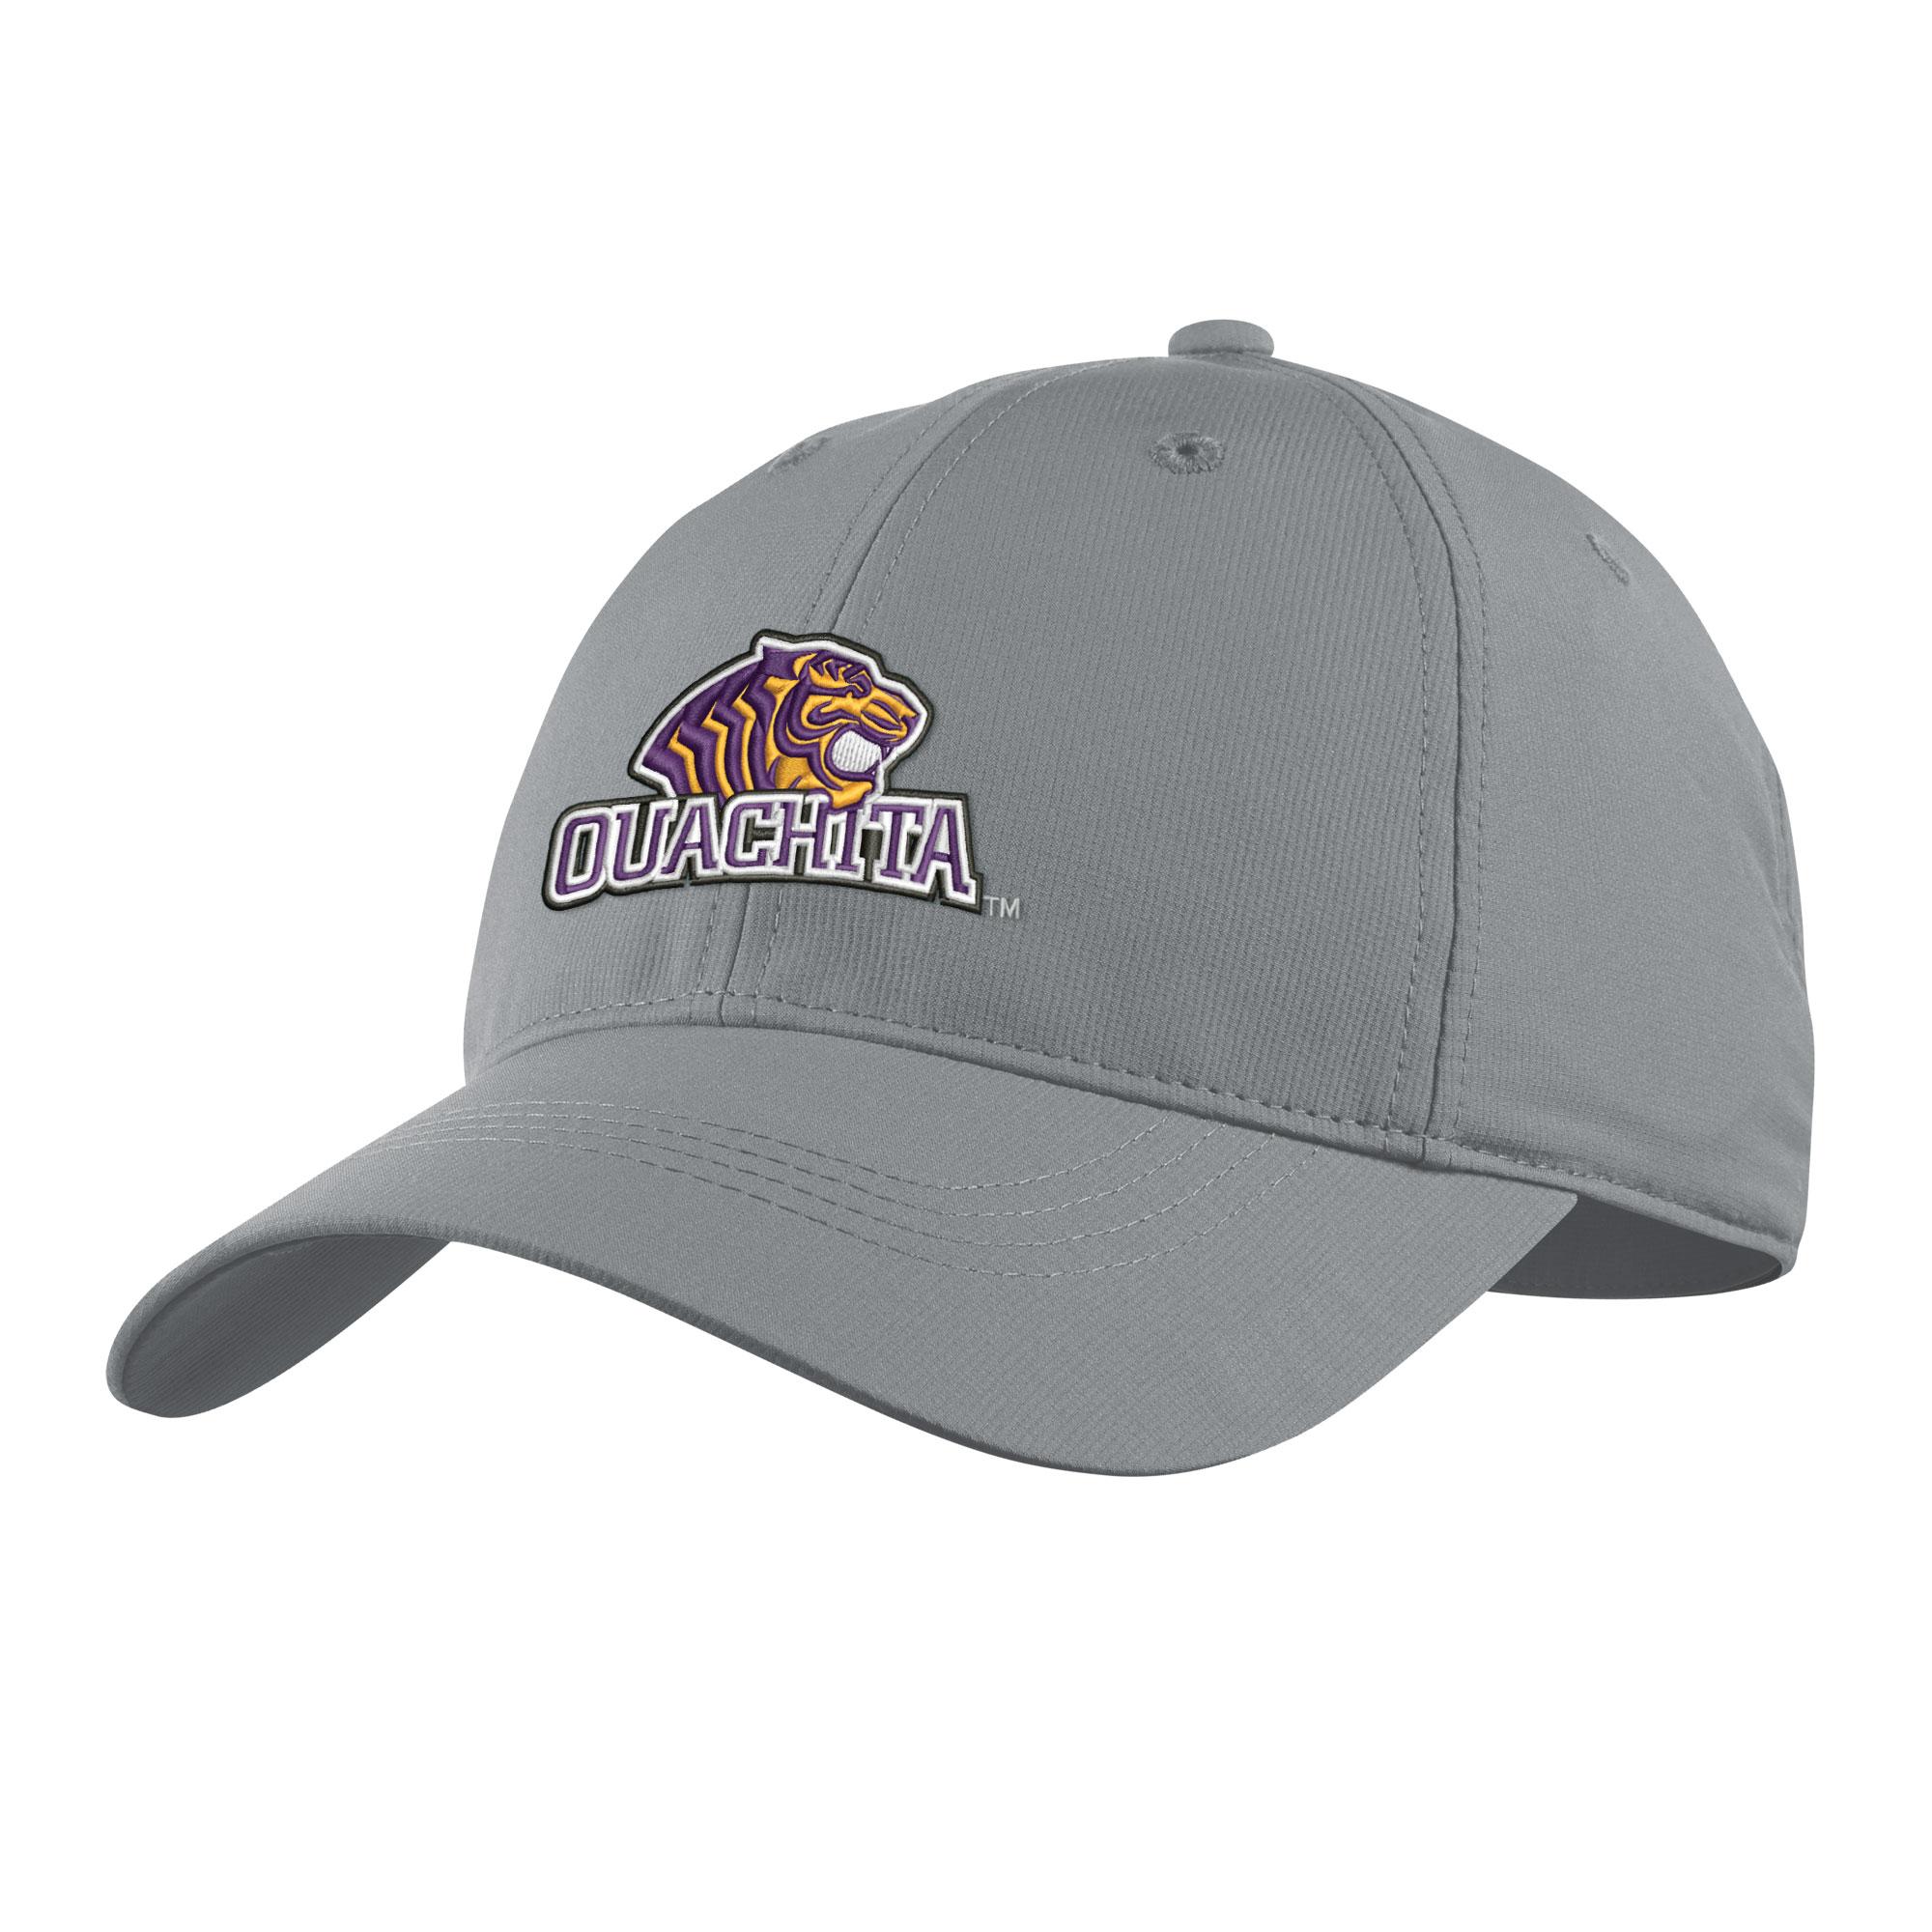 image of: OUACHITA LOGO GOLF TECH CAP